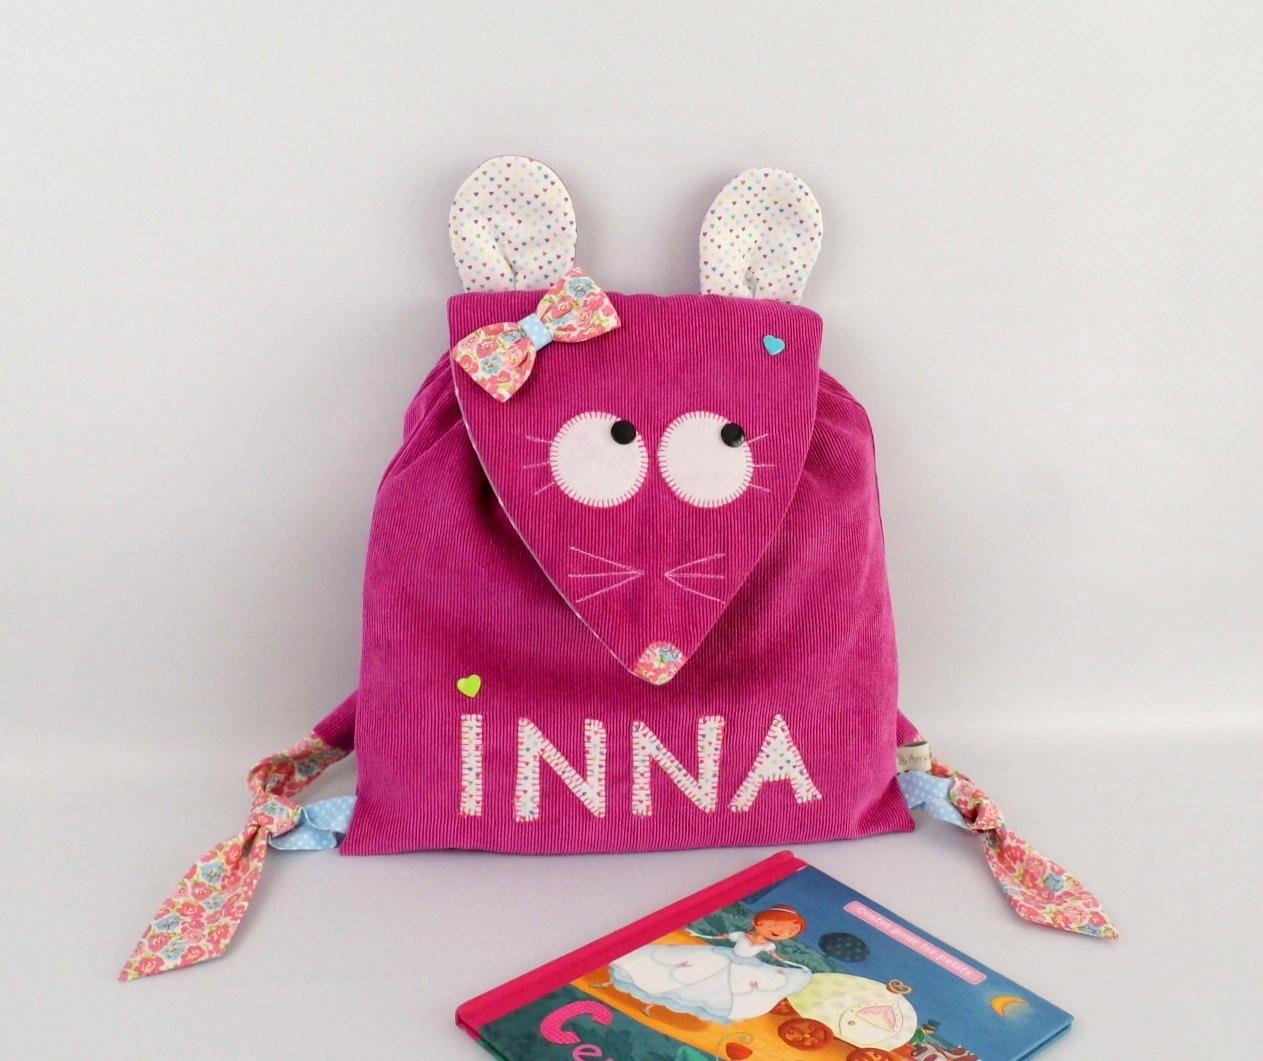 Sac fille souris rose fuchsia personnalisé prénom Inna motifs coeurs fleurs liberty mouse personnalized name backpack pink